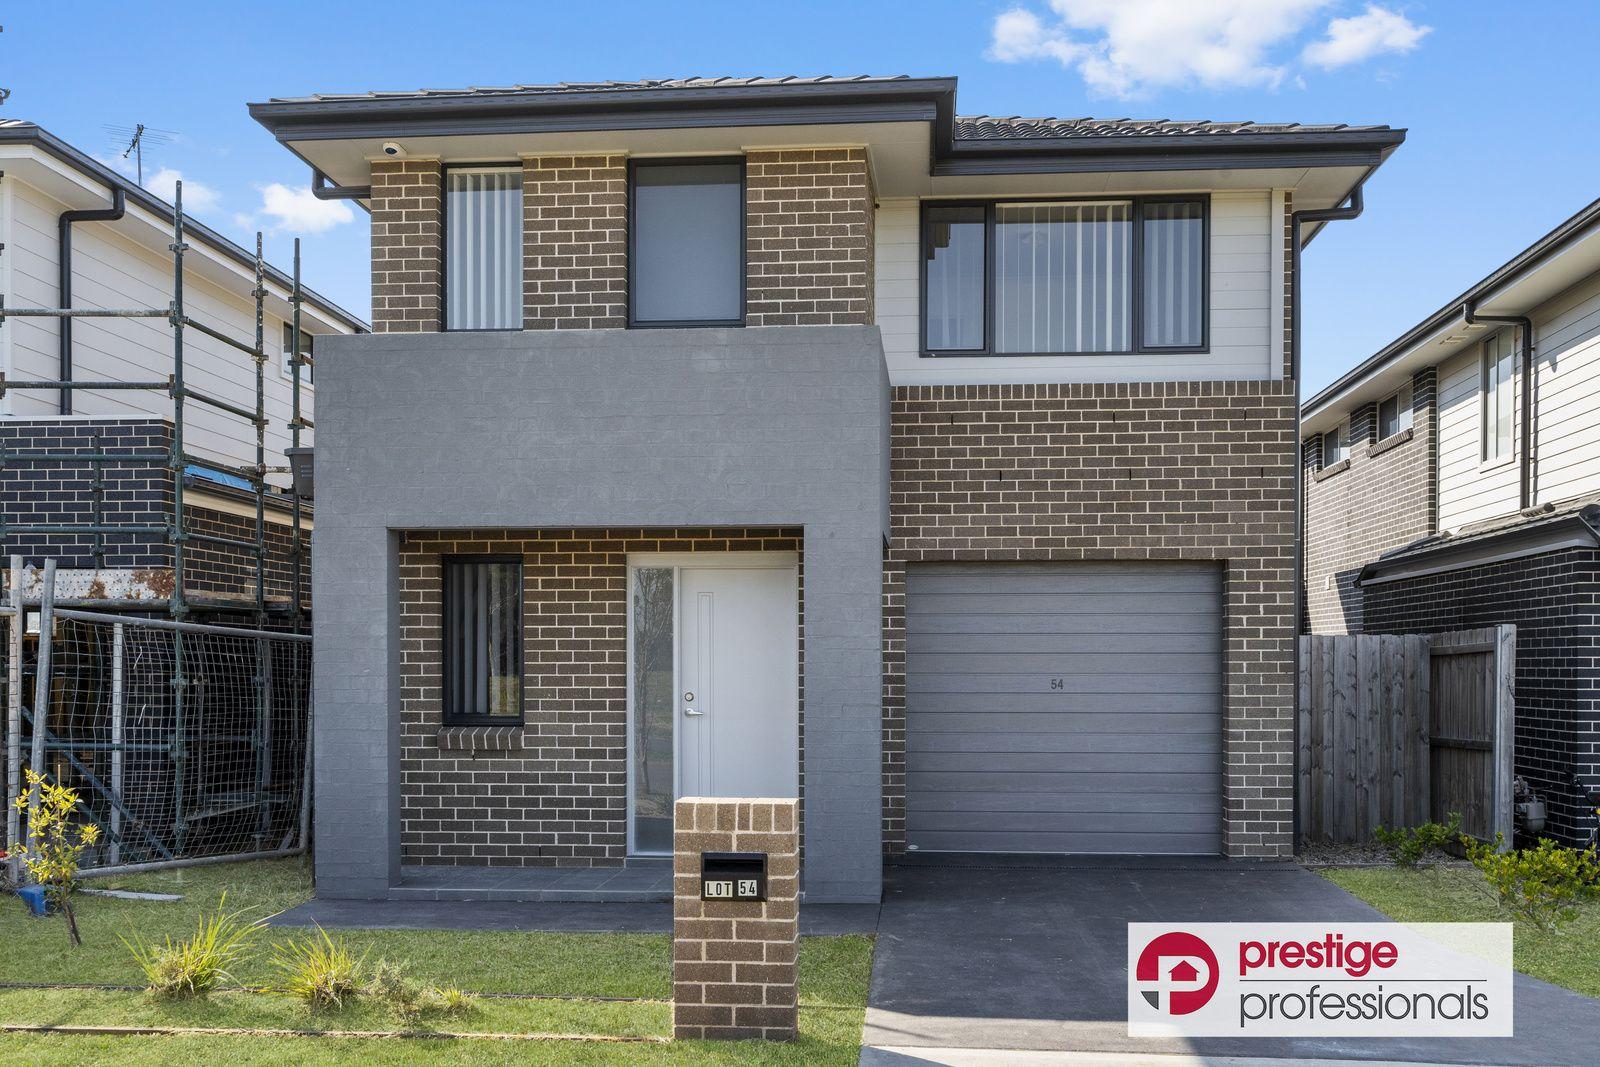 Lot 54, 23 Crown Street, Austral NSW 2179, Image 0